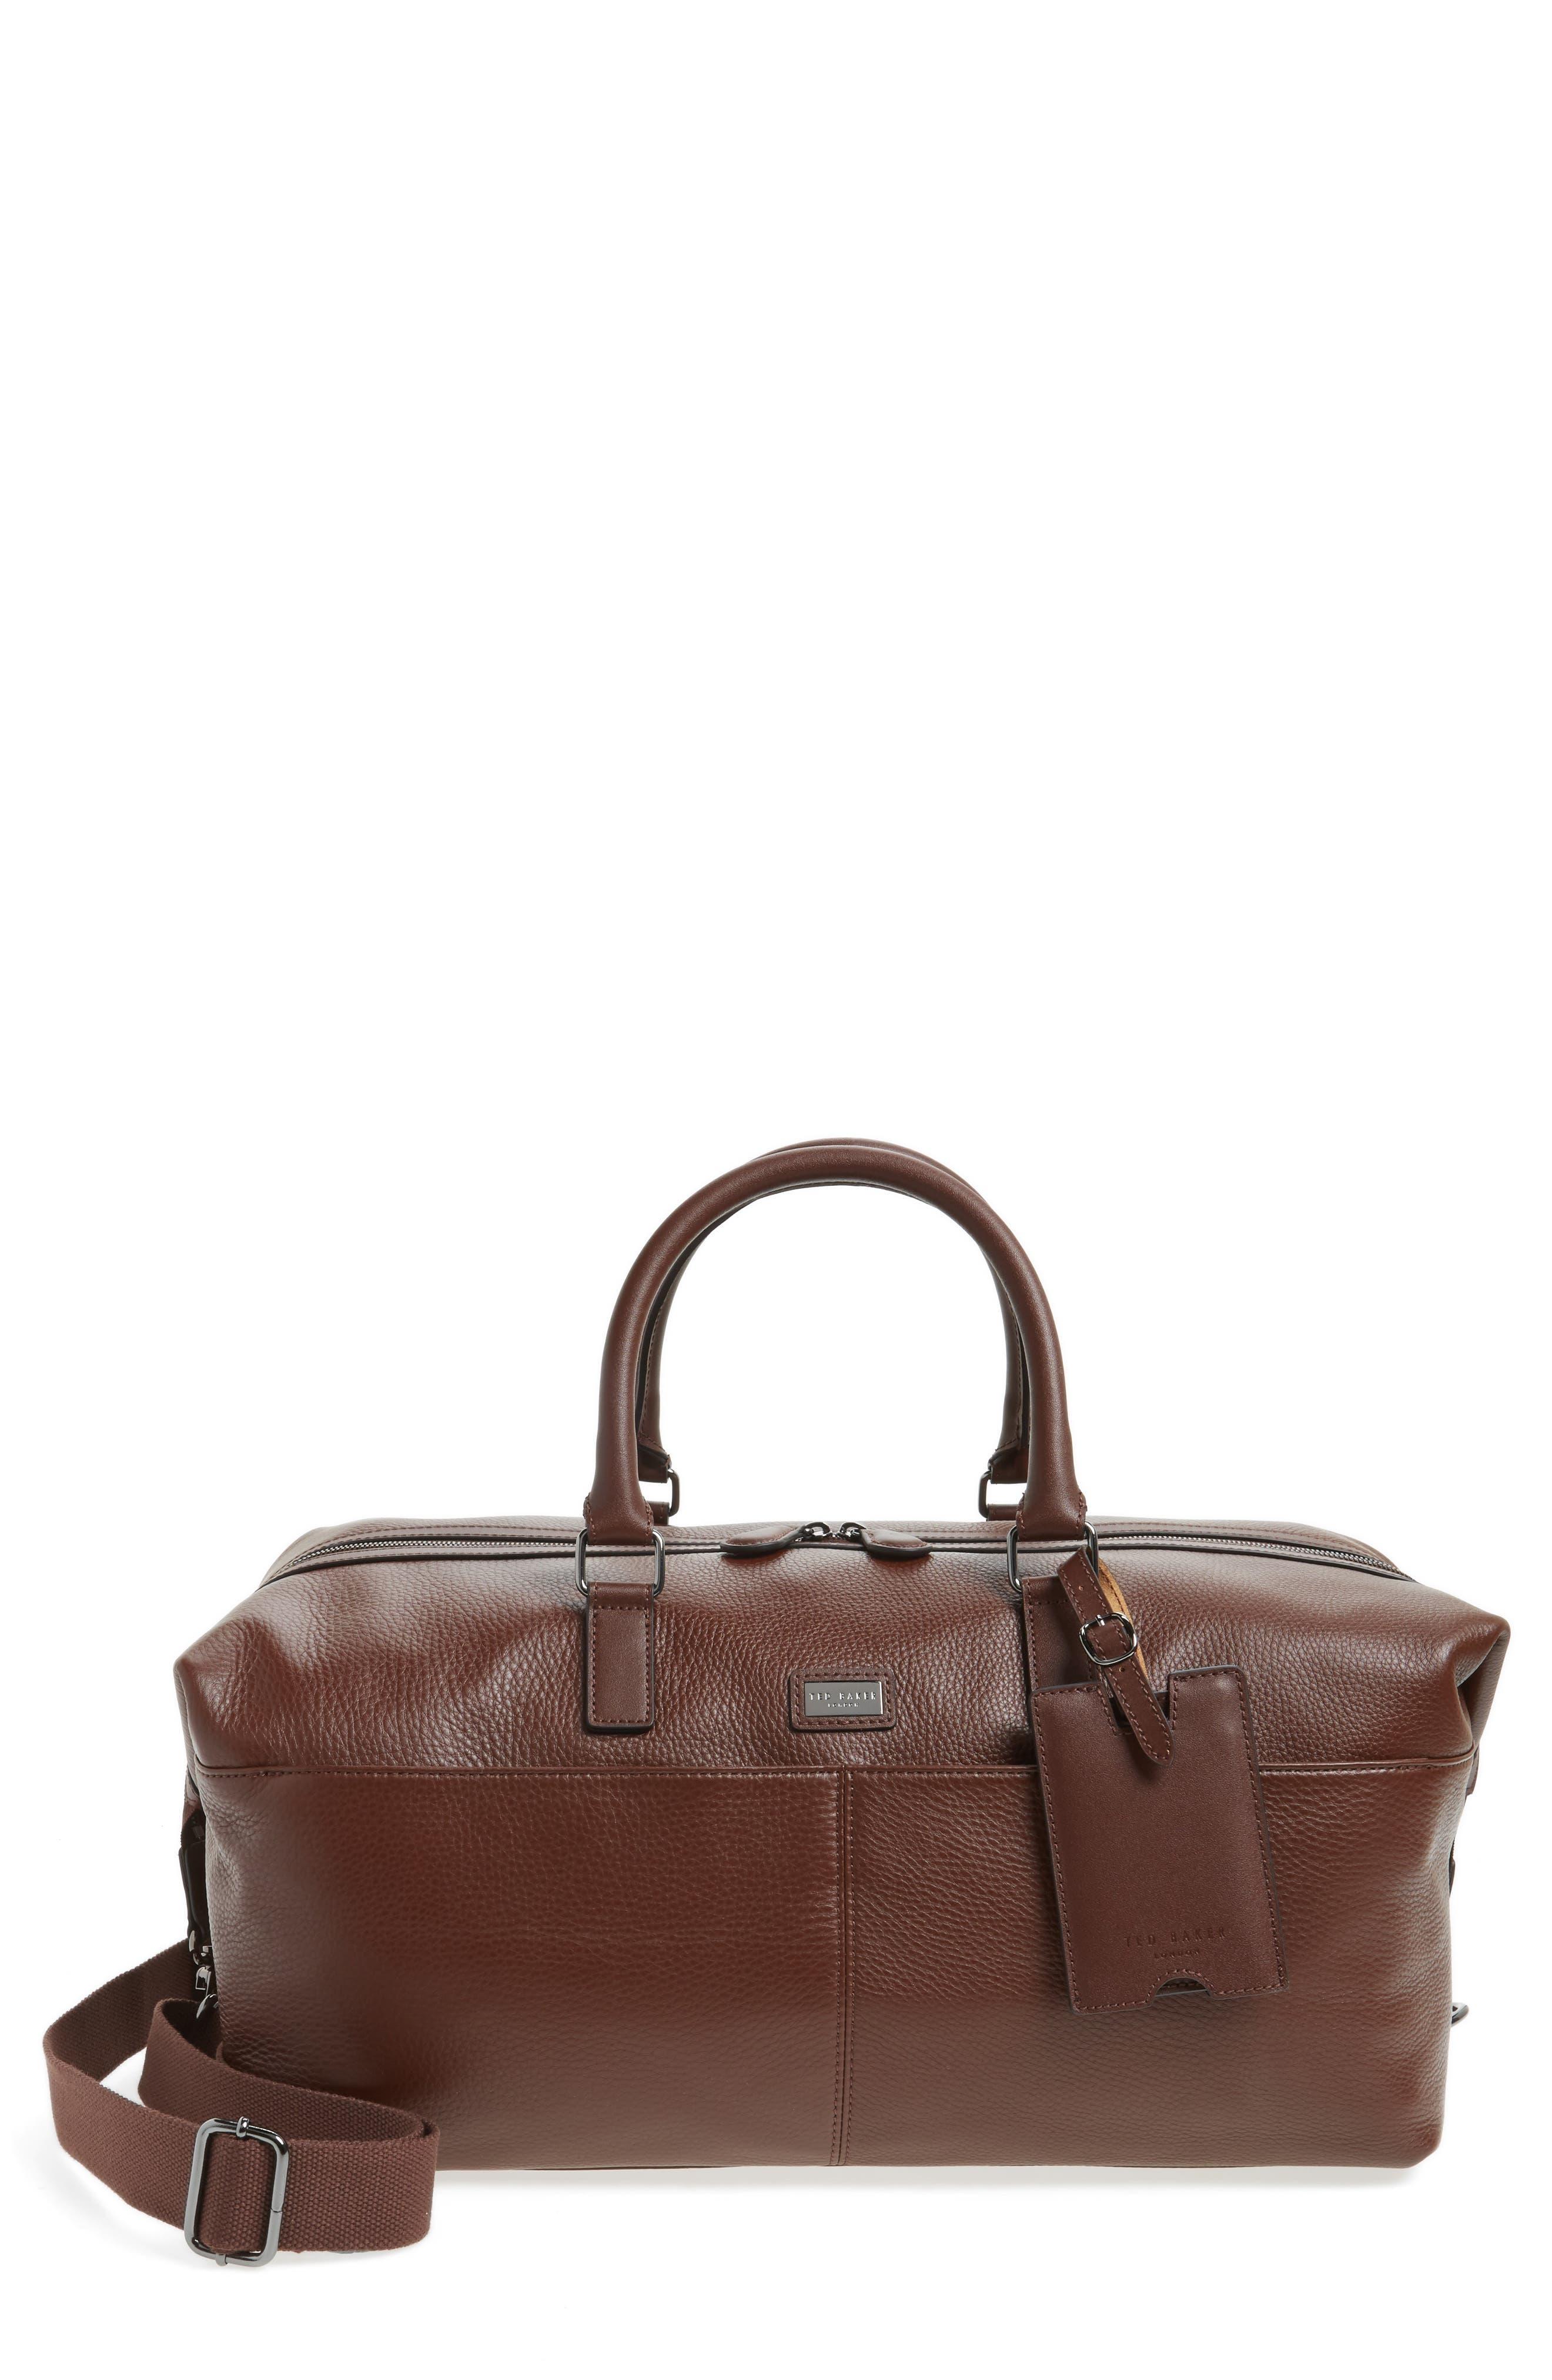 Alternate Image 1 Selected - Ted Baker London Leather Duffel Bag